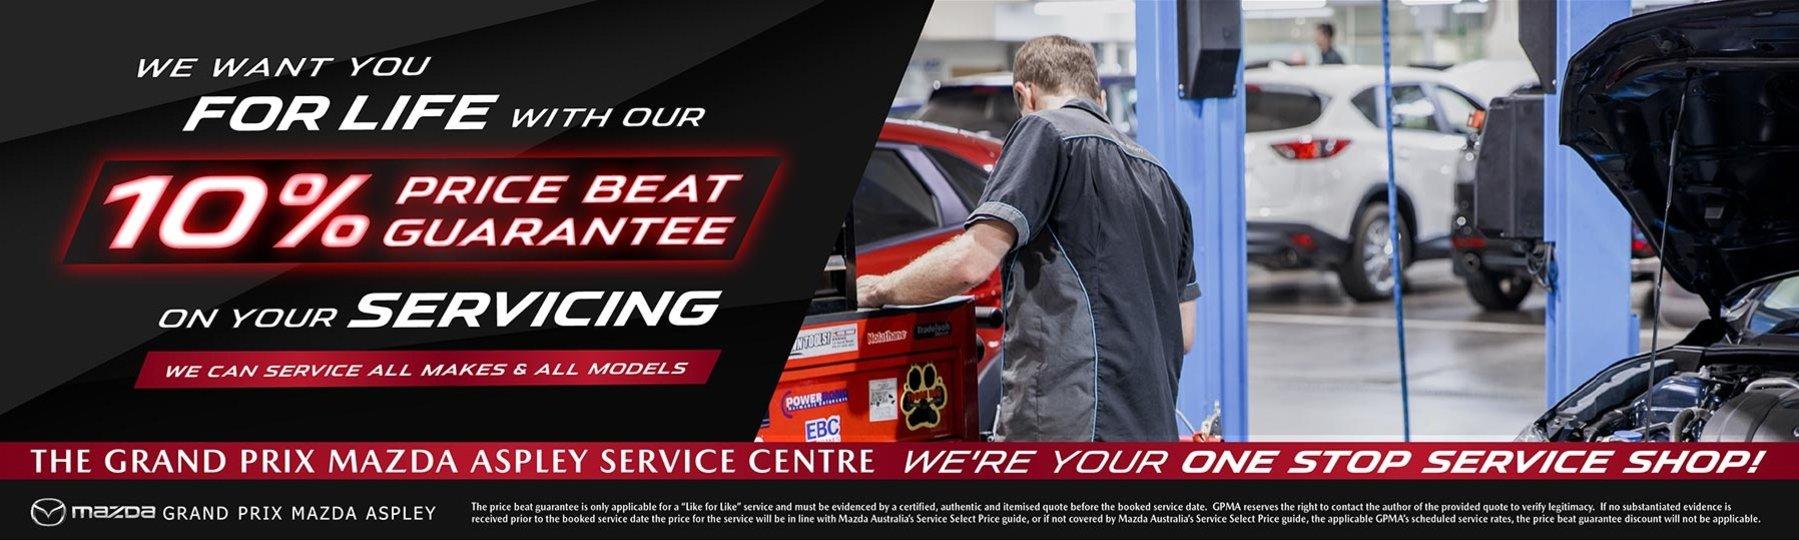 Grand Prix Mazda Service Offer